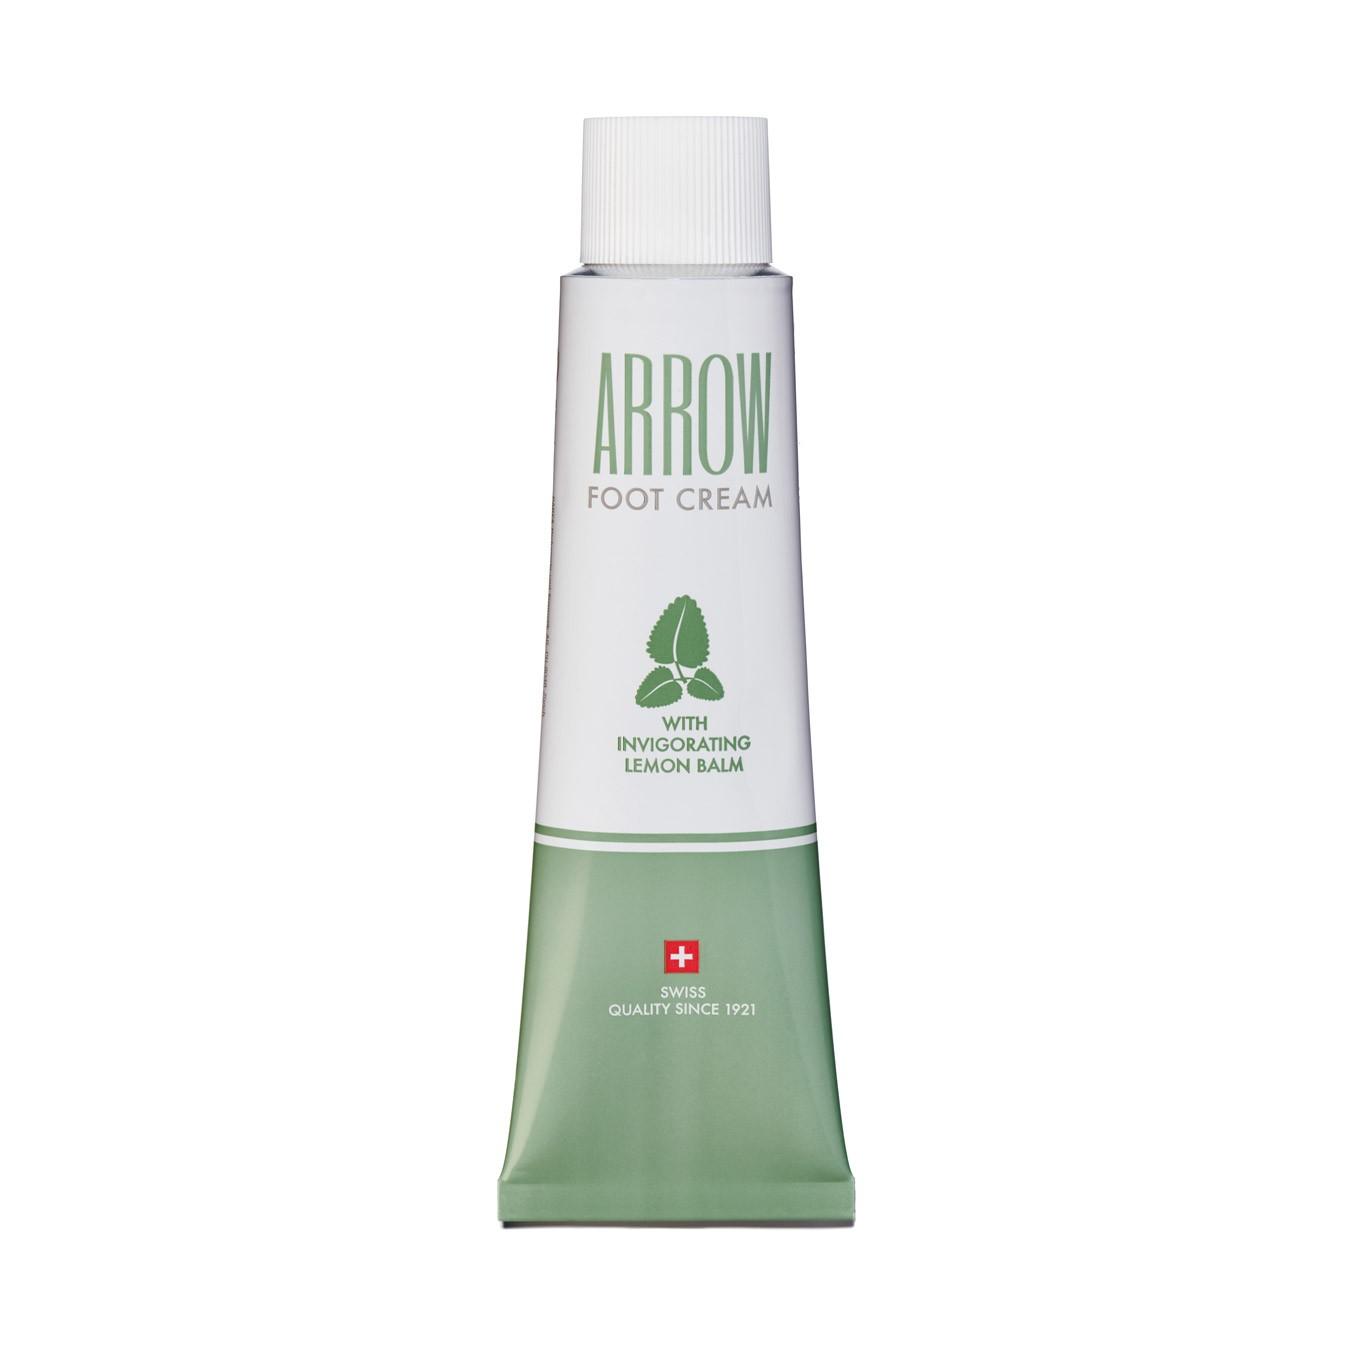 Arrow - Foot Cream with Lemon Balm (65 ML)